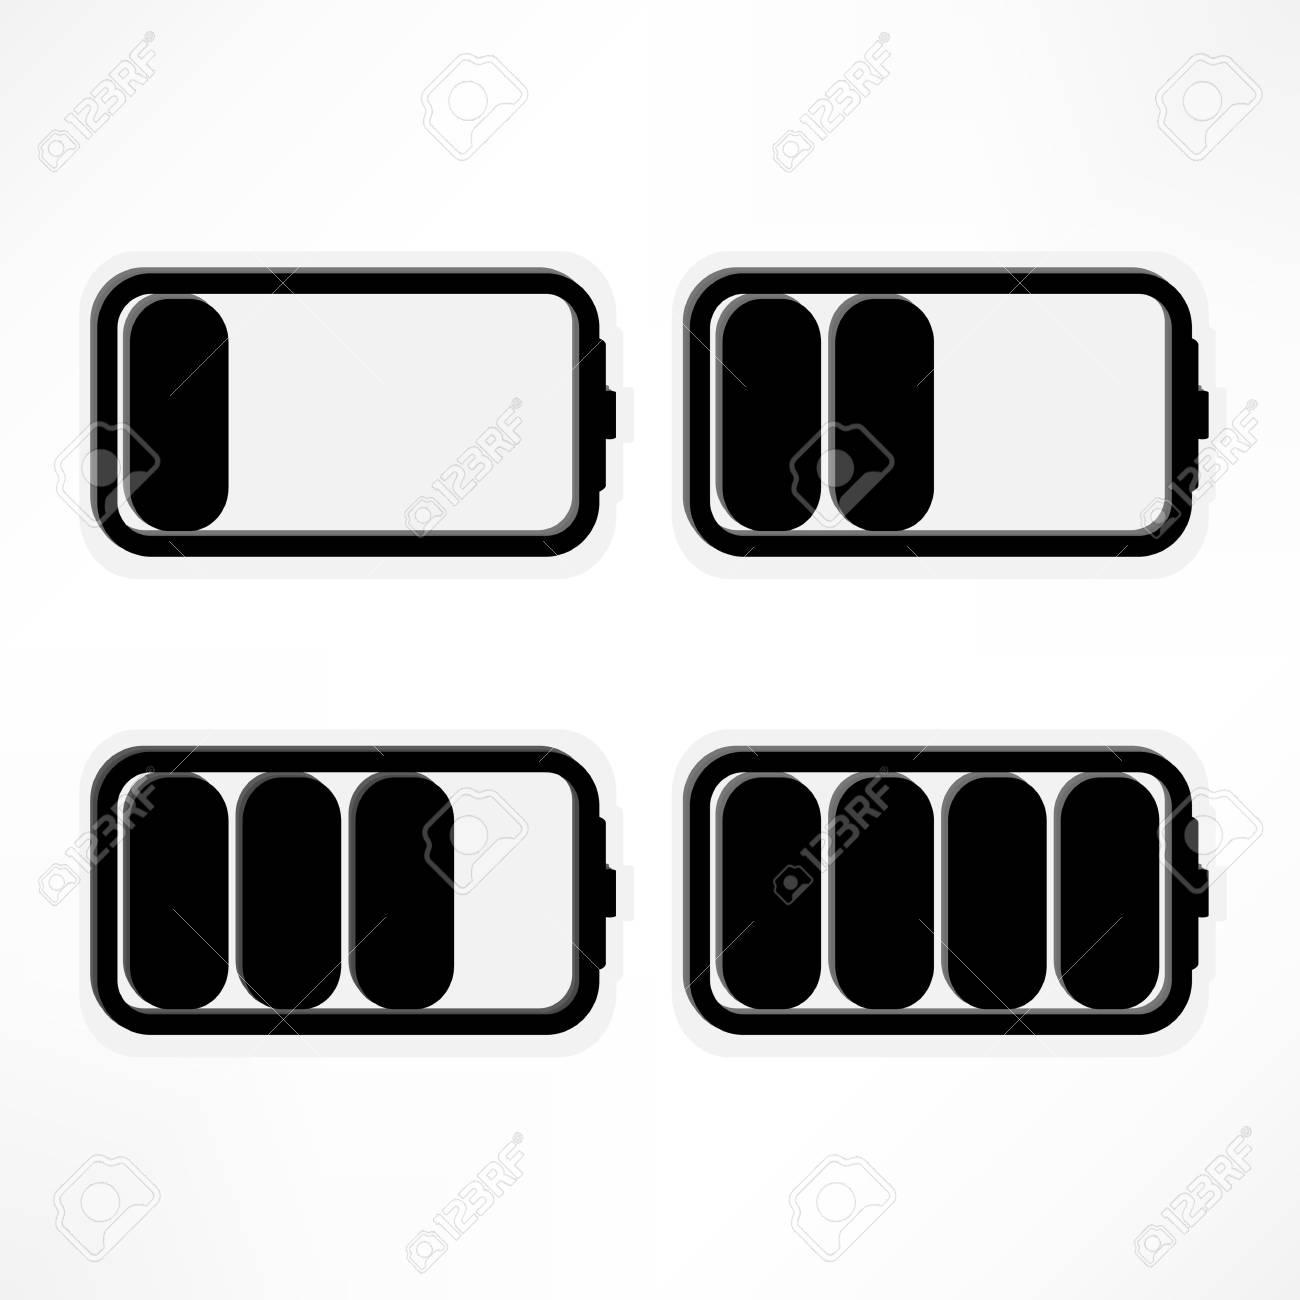 Set of battery charge level indicators. Vector illustration. Stock Photo - 16168767